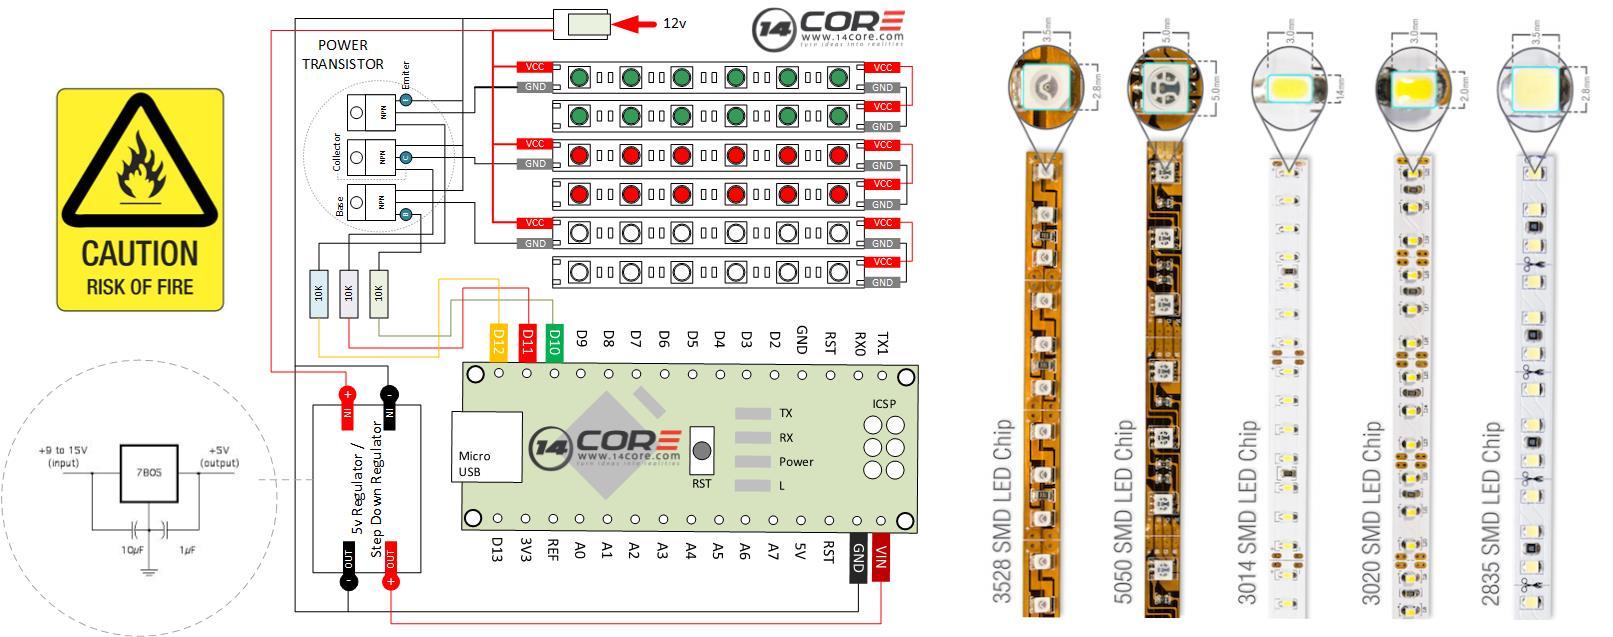 smd led wiring diagram data wiring expertise led light wiring arduino led strip light show centralroots com smd led types wiring smd led wiring diagram